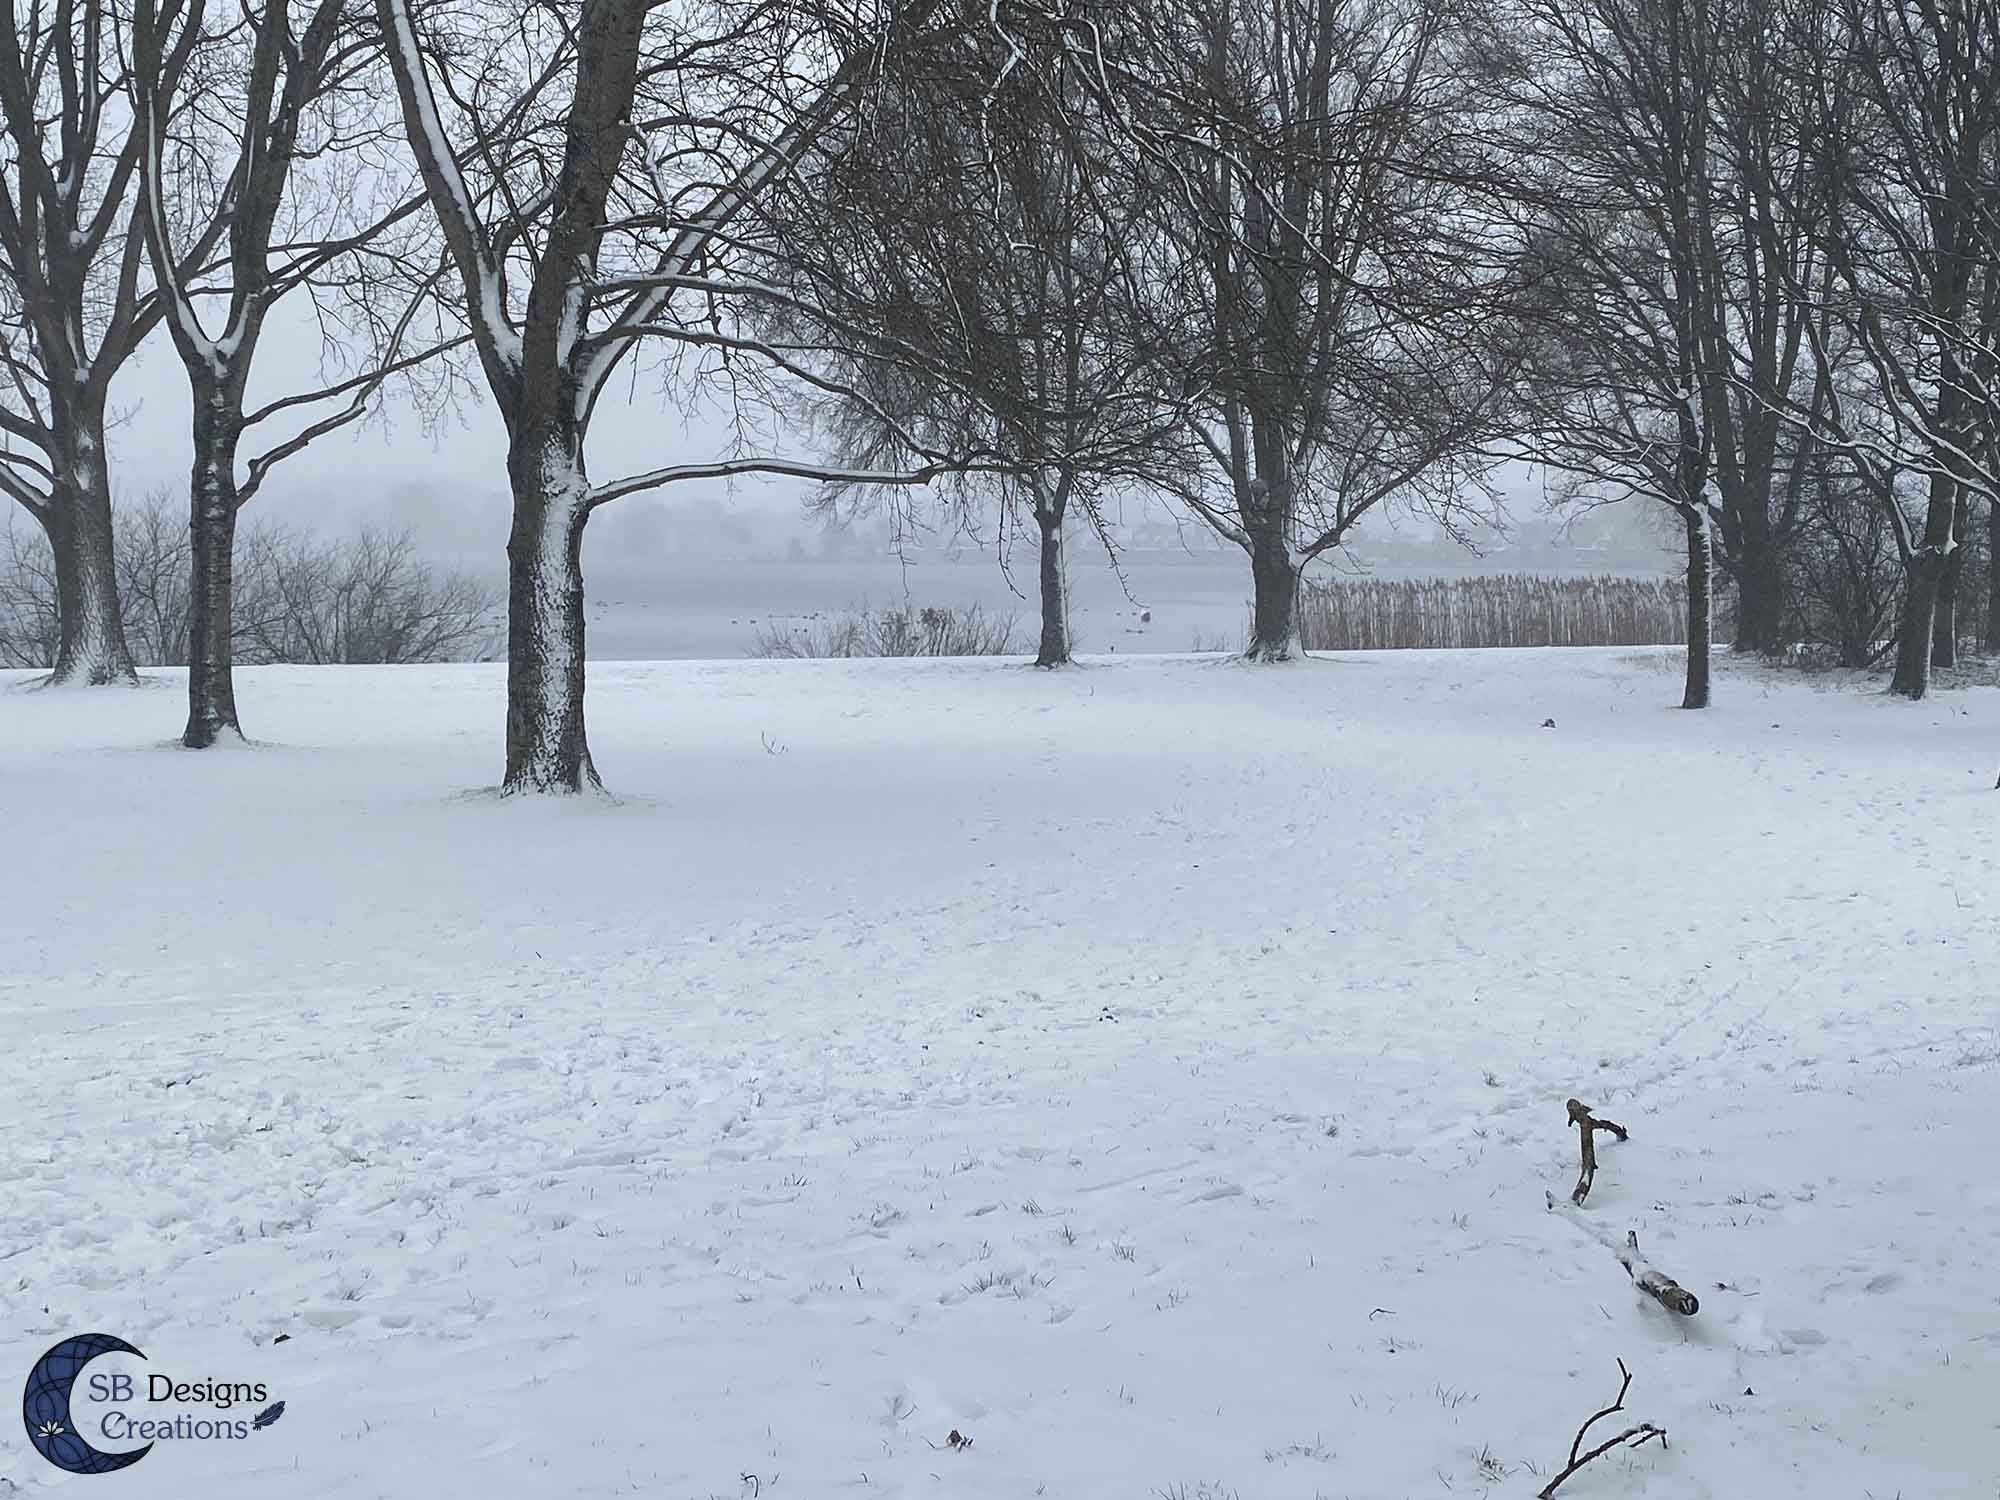 Winter-Wonderland-Inspiratie-Artist-Life